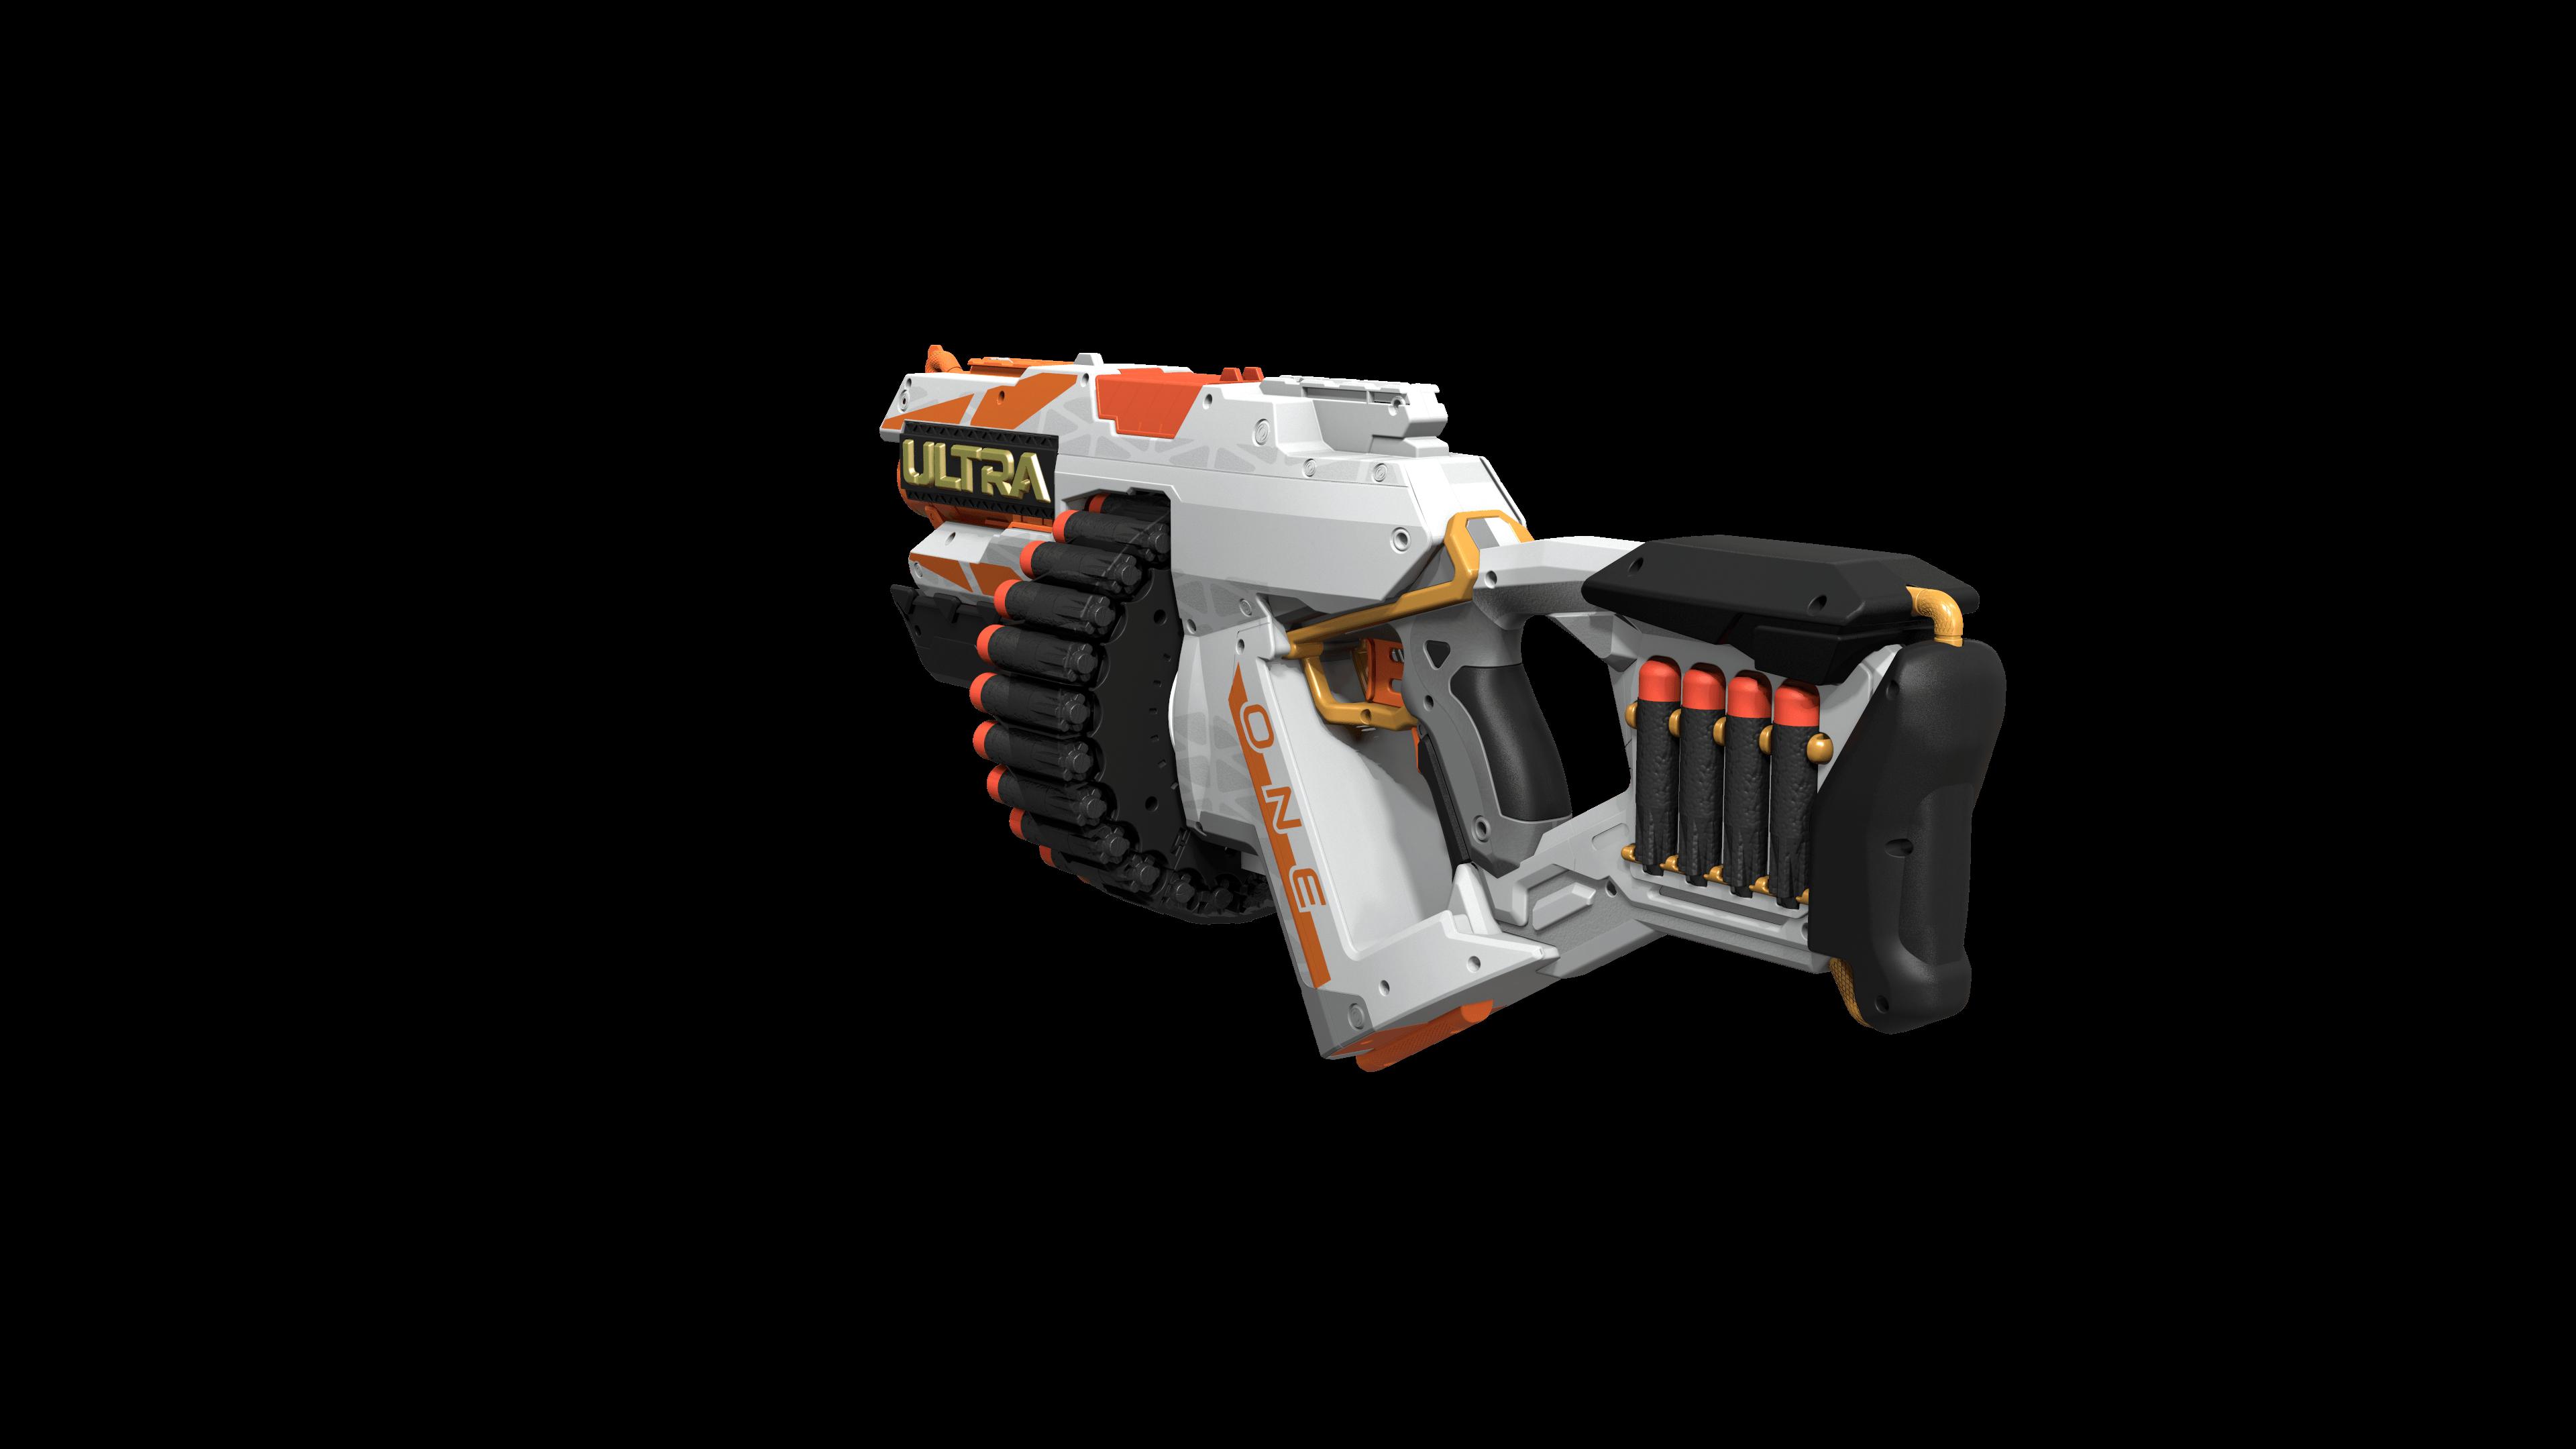 ultra blaster img 43